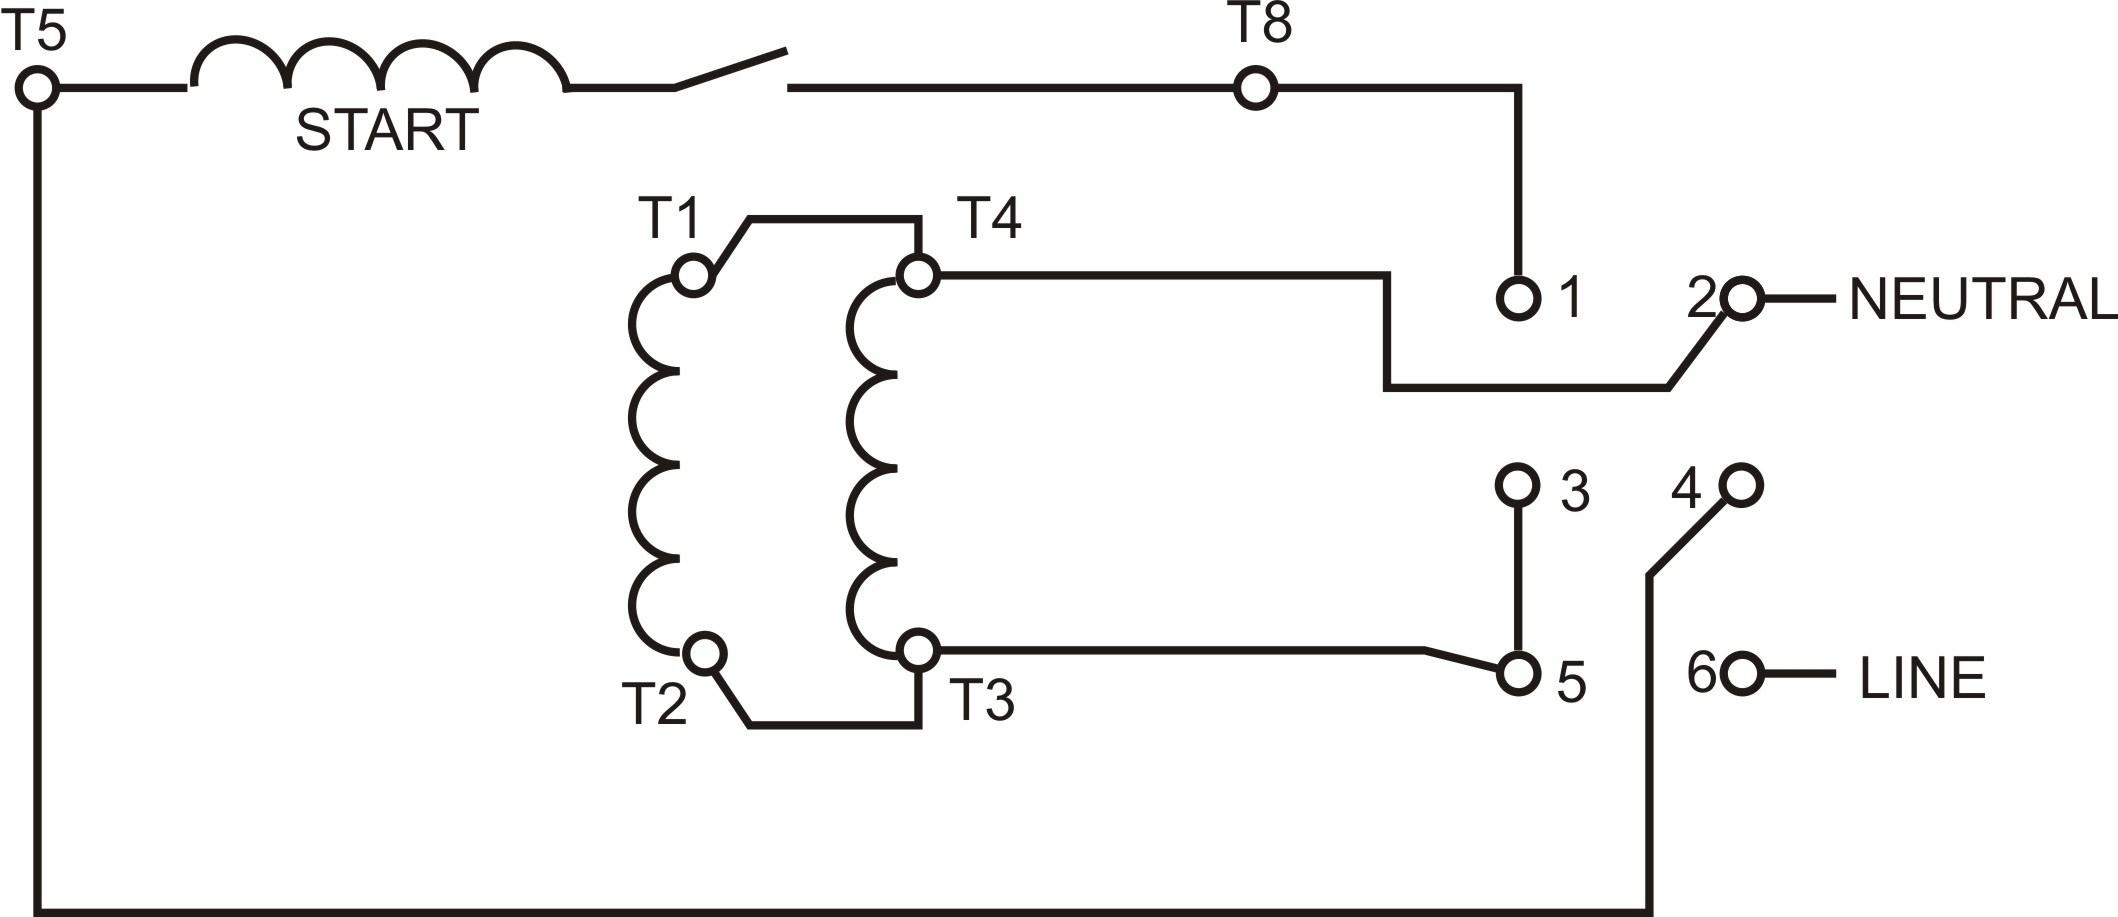 Doerr Electric Motor Lr Wiring Diagram